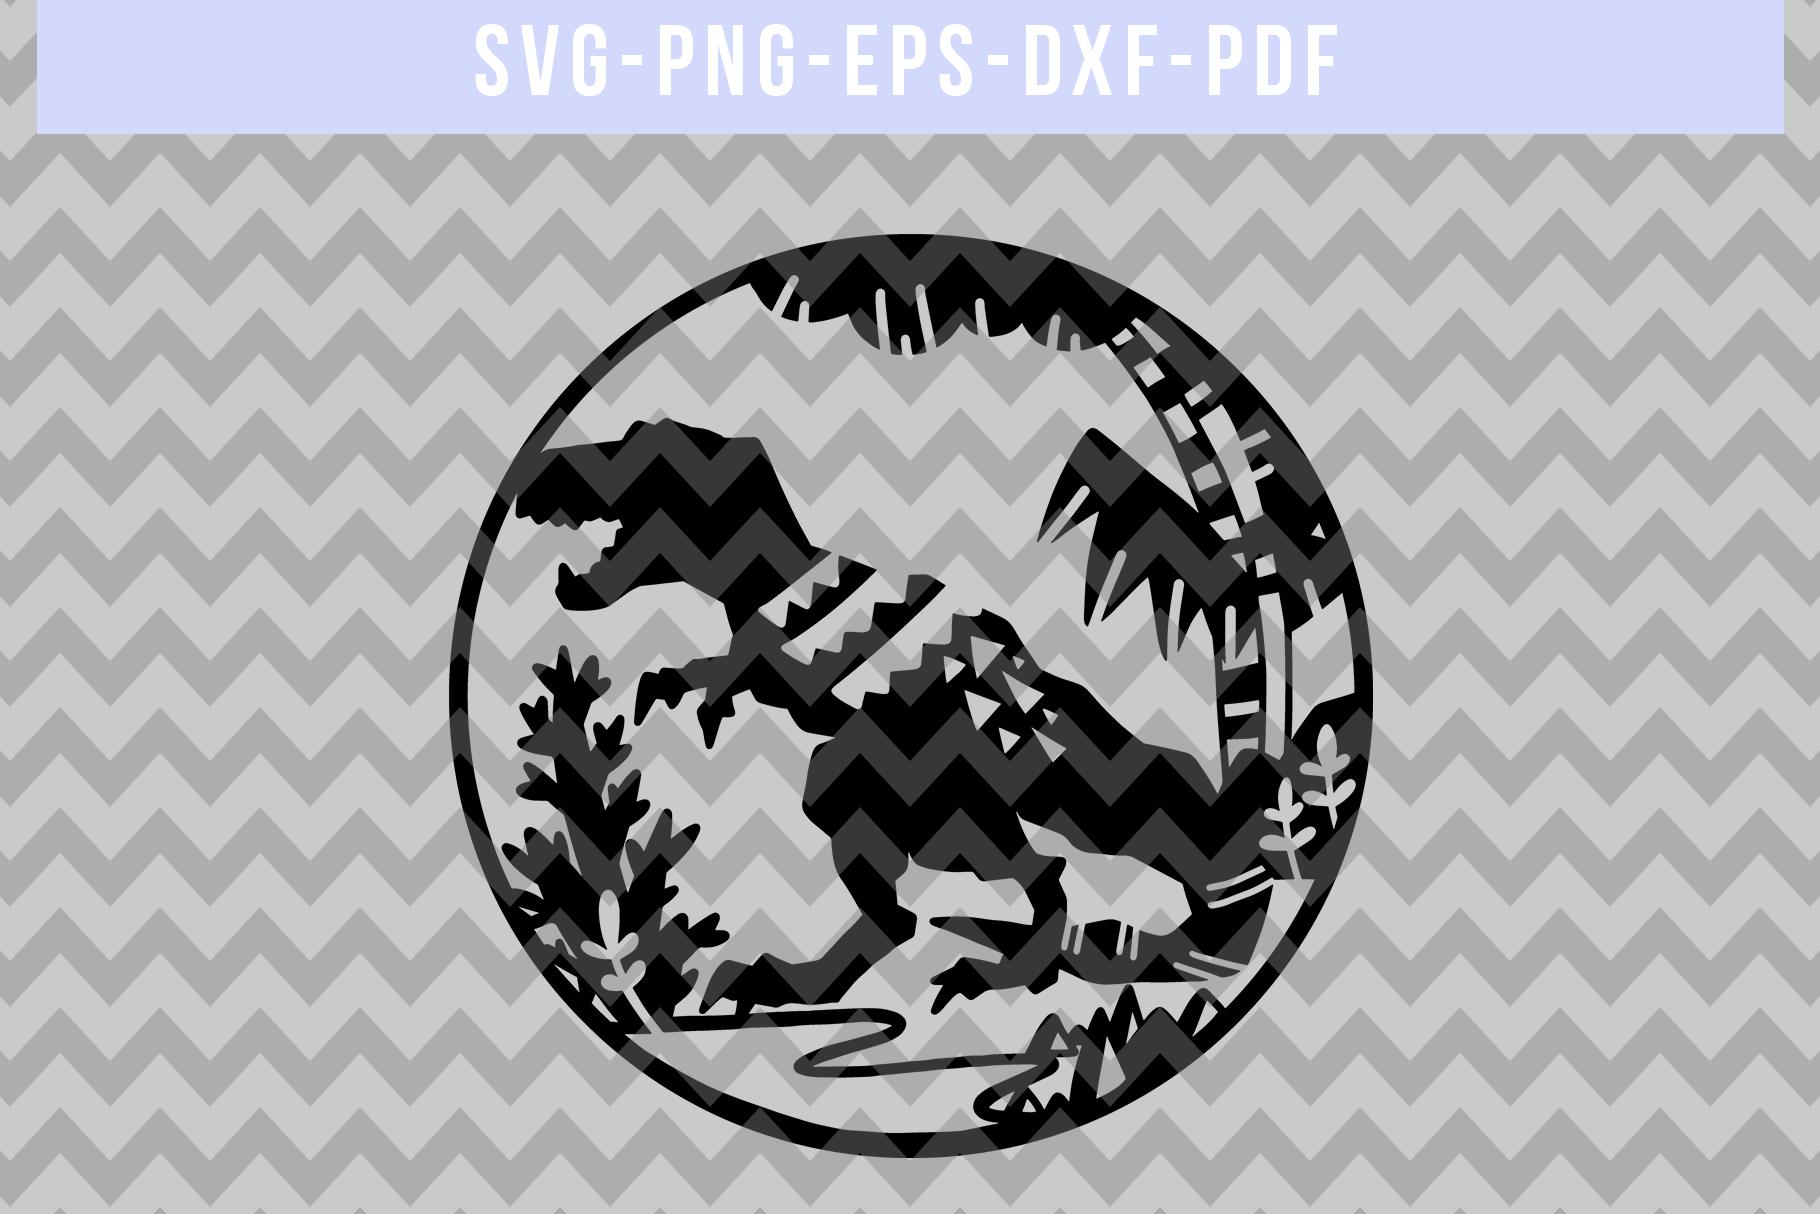 Dinosaur Papercut Template, T-Rex SVG, Baby Cut File DXF PDF example image 4